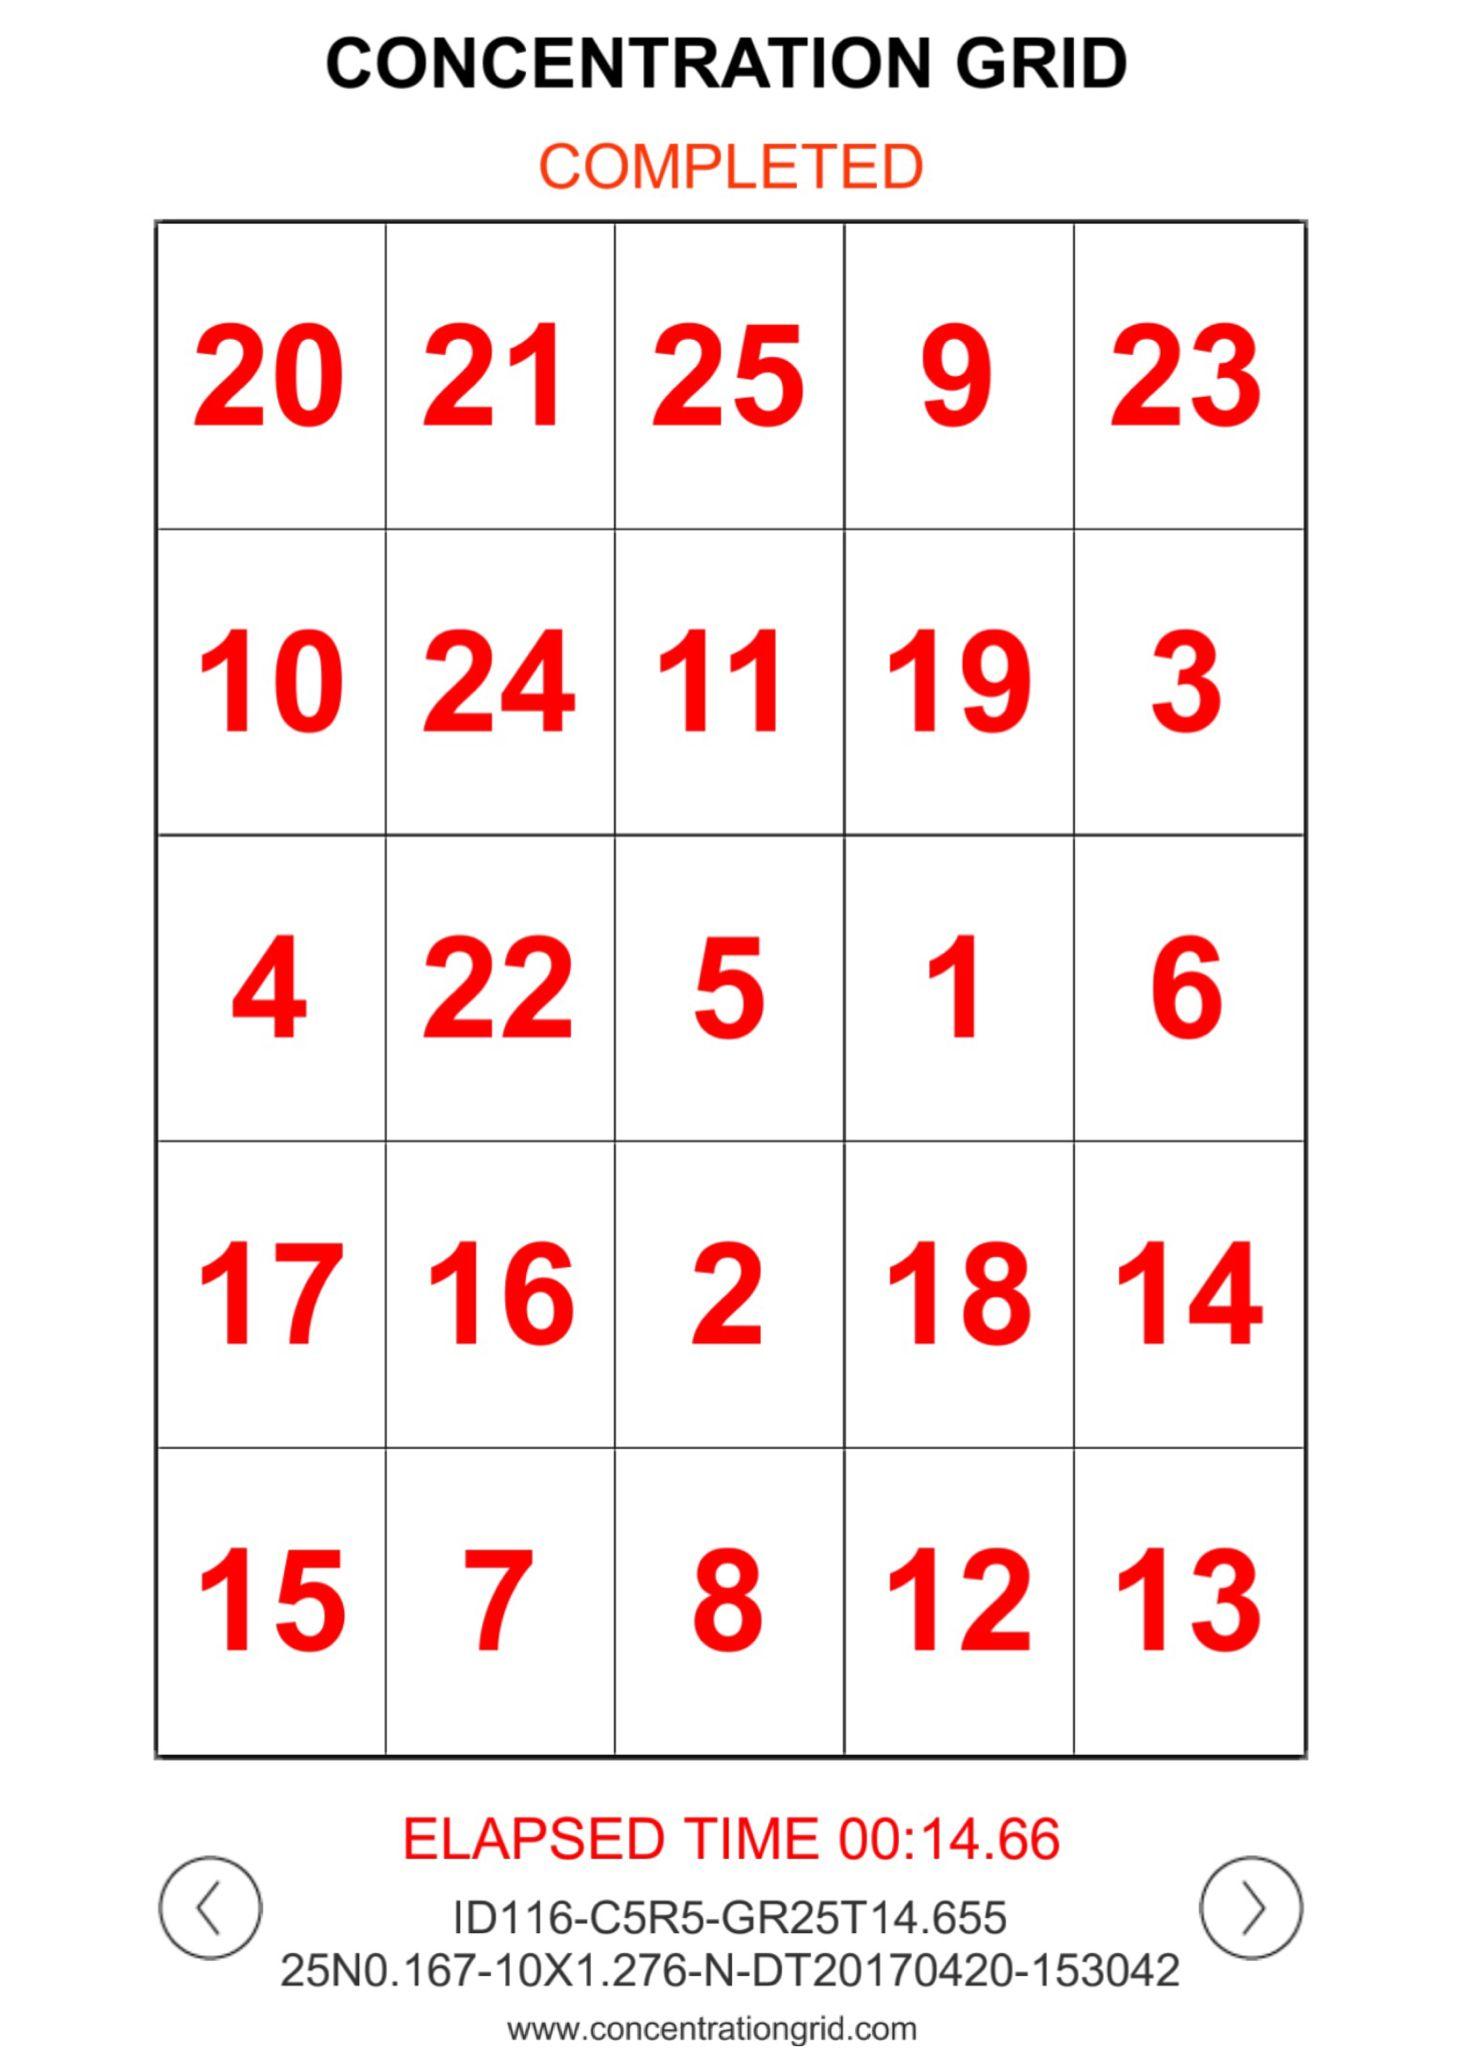 Concentration grid mental skills training app apple